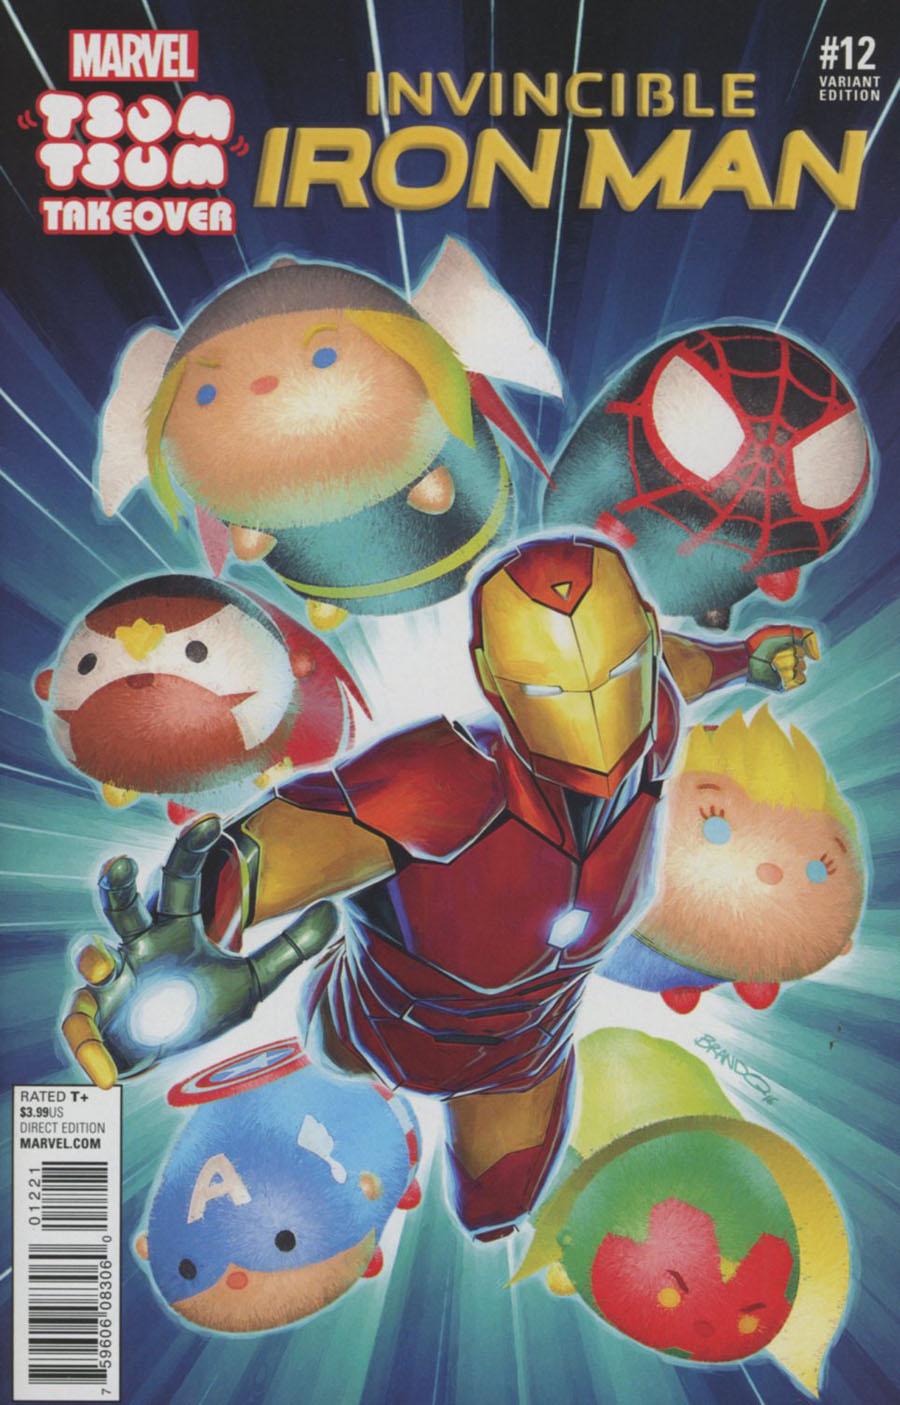 Invincible Iron Man Vol 2 #12 Cover B Variant Brandon Peterson Marvel Tsum Tsum Takeover Cover (Civil War II Tie-In)